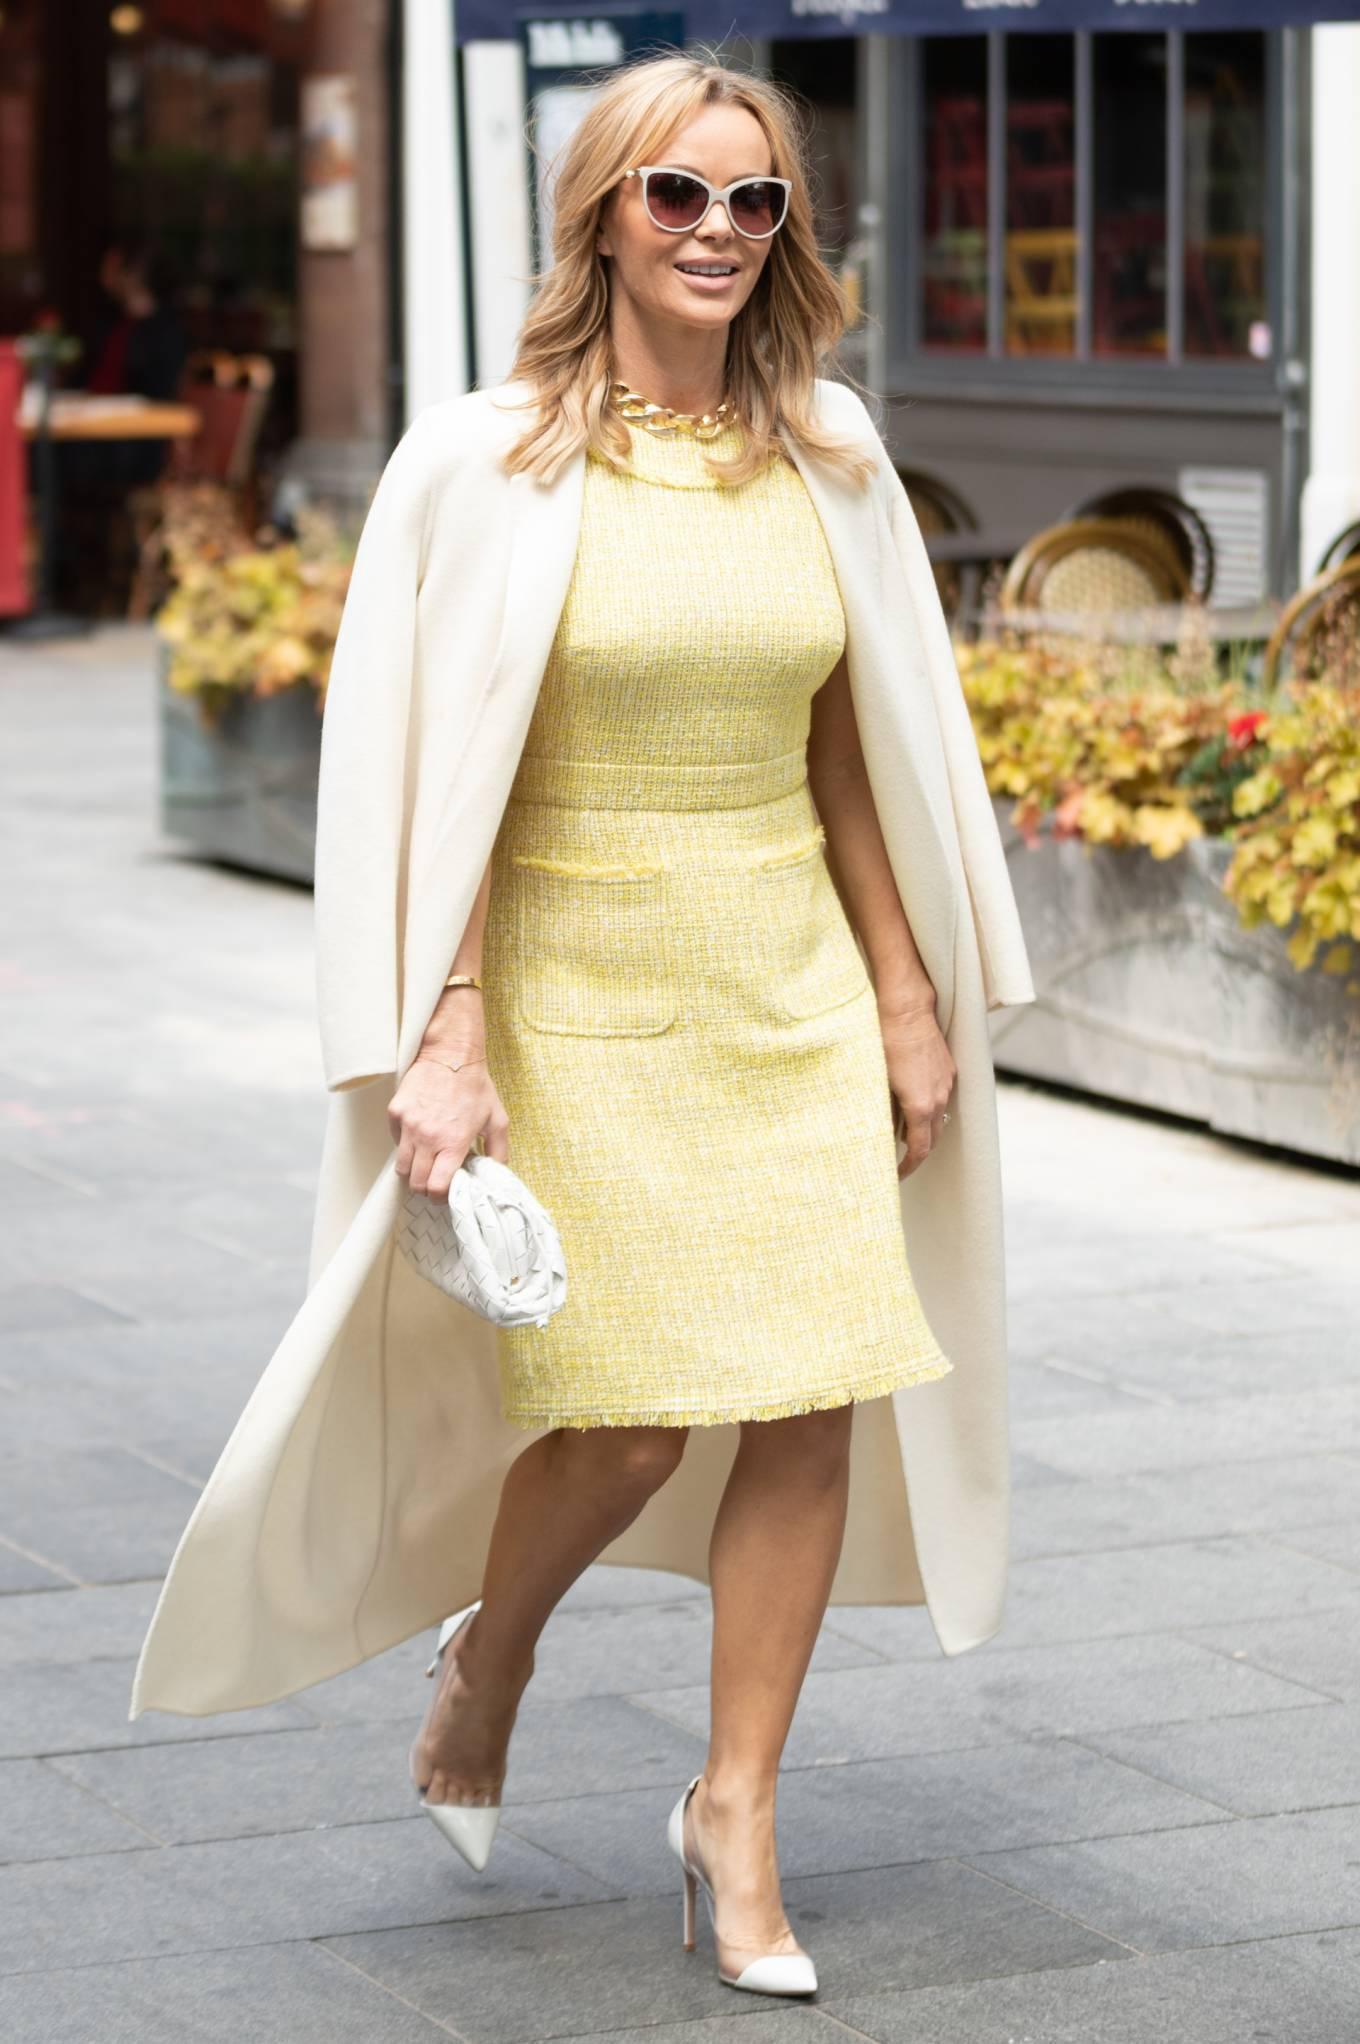 Amanda Holden - In yellow dress and a cream long coat at Heart radio London